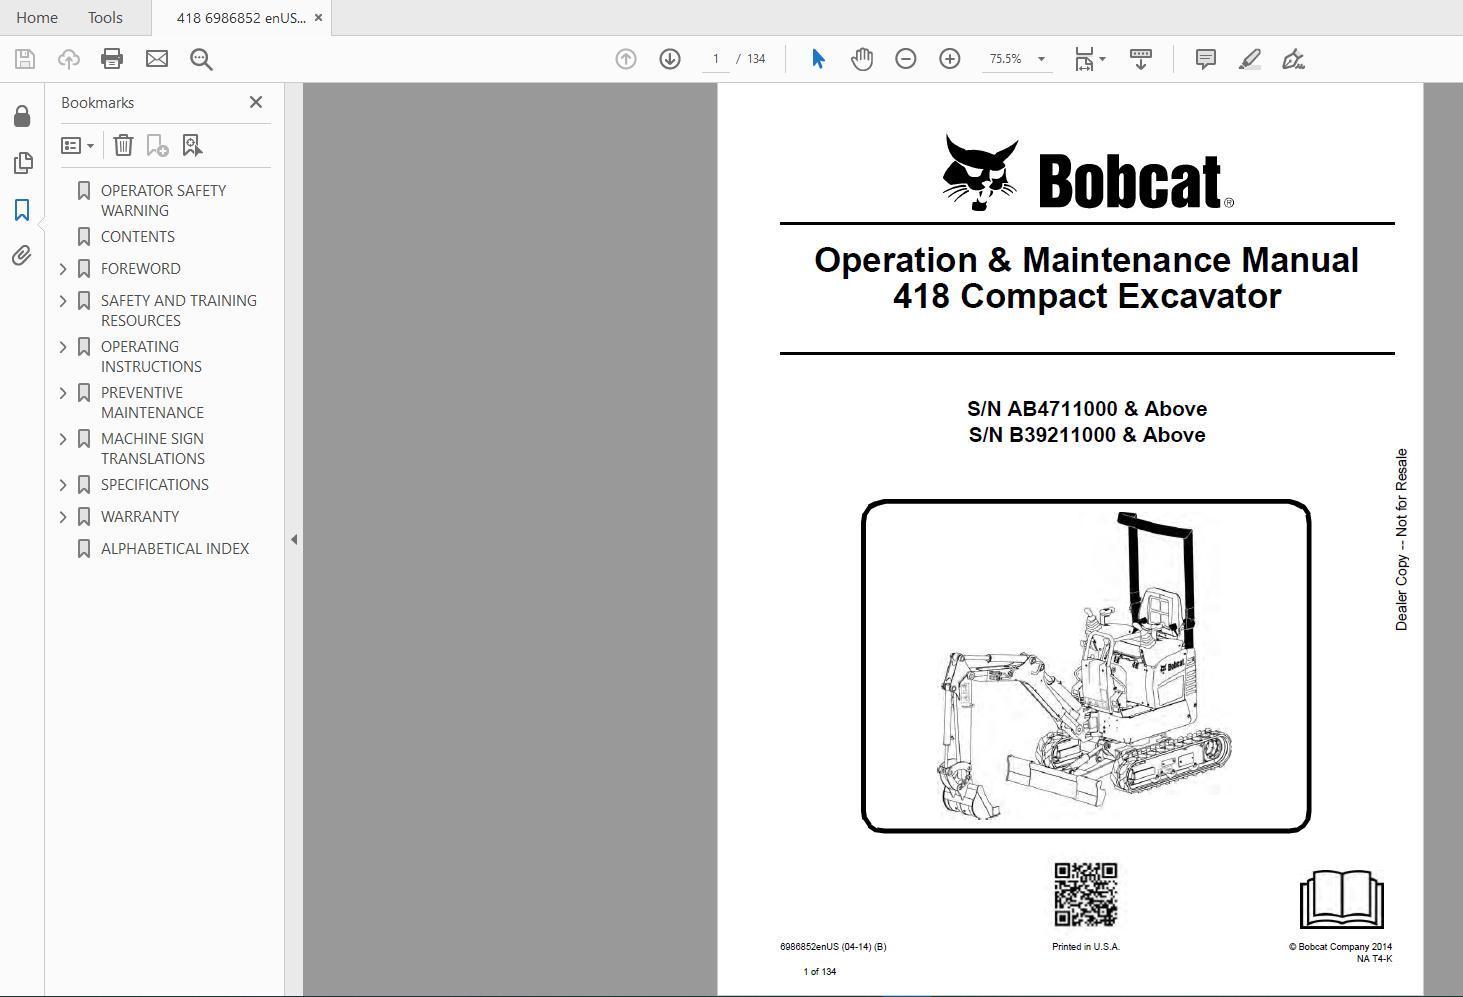 Bobcat_Excavator_Service_Library_2017_DVD3